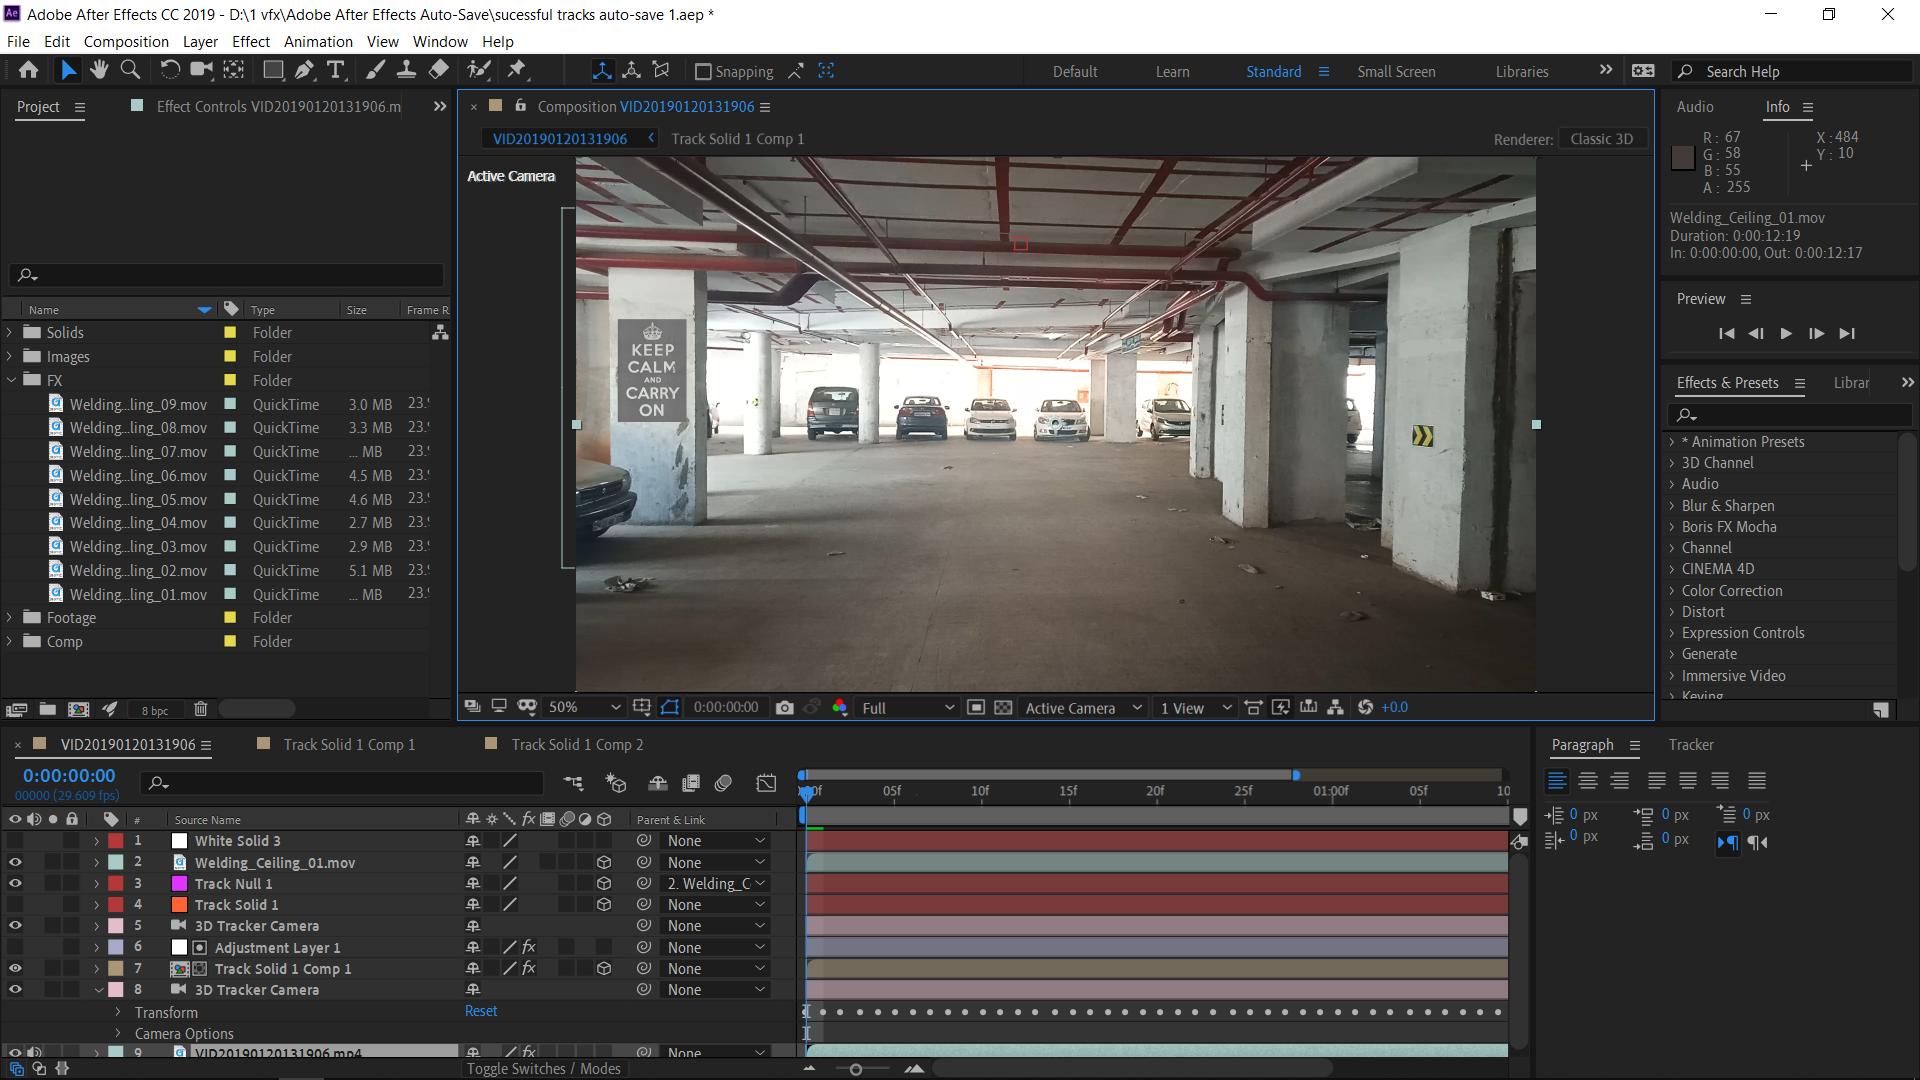 Logo Desgn, Image Editing, Video Editing & Colo...